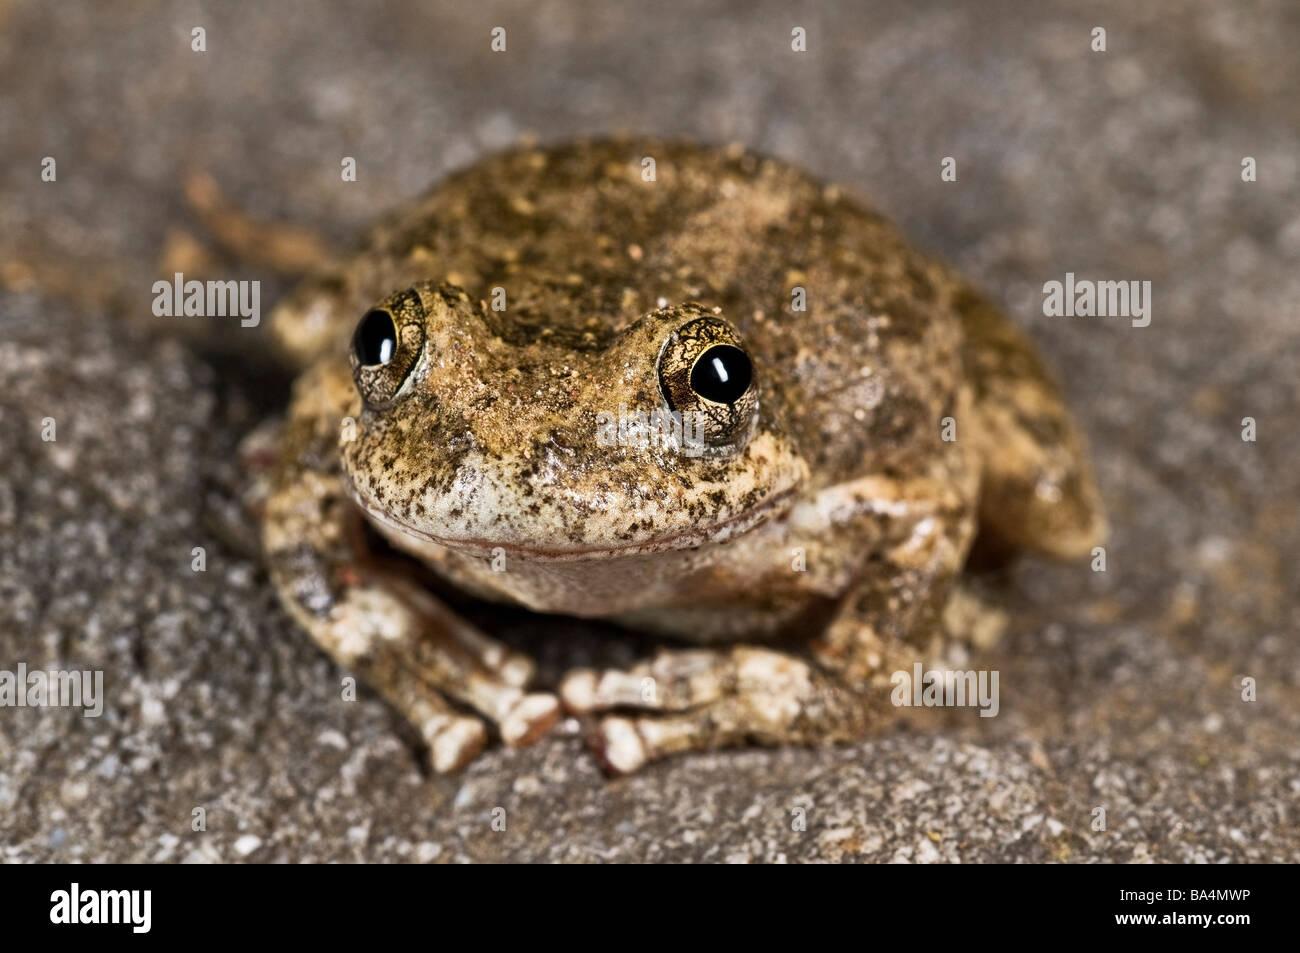 California tree frog (Pseudacris cadaverina) Stock Photo